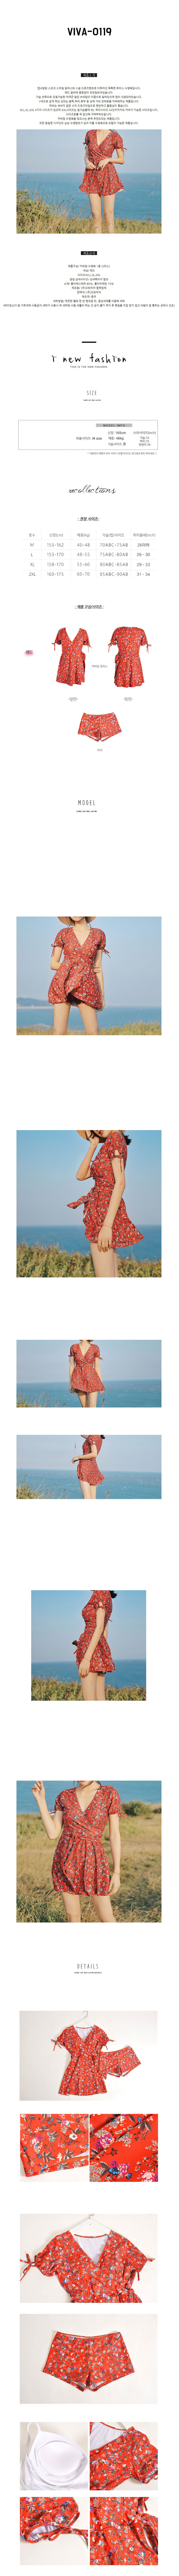 O119 플라워 여성 여름 원피스 수영복 - 익스트리모, 71,000원, 수영복/래쉬가드, 수영복